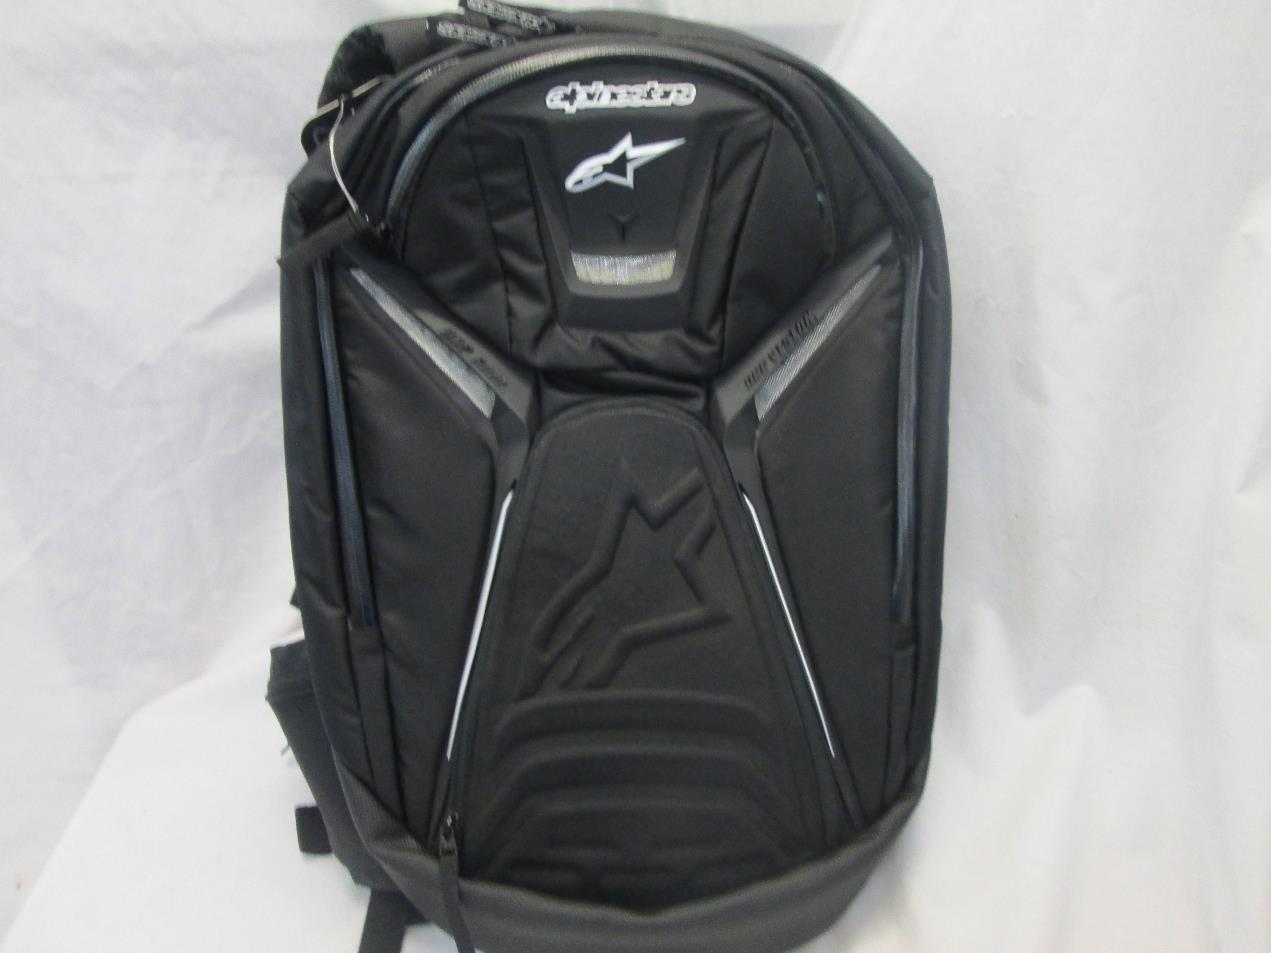 Alpinestars tech aero motorcycle backpack black ebay - Alpinestars tech aero ...